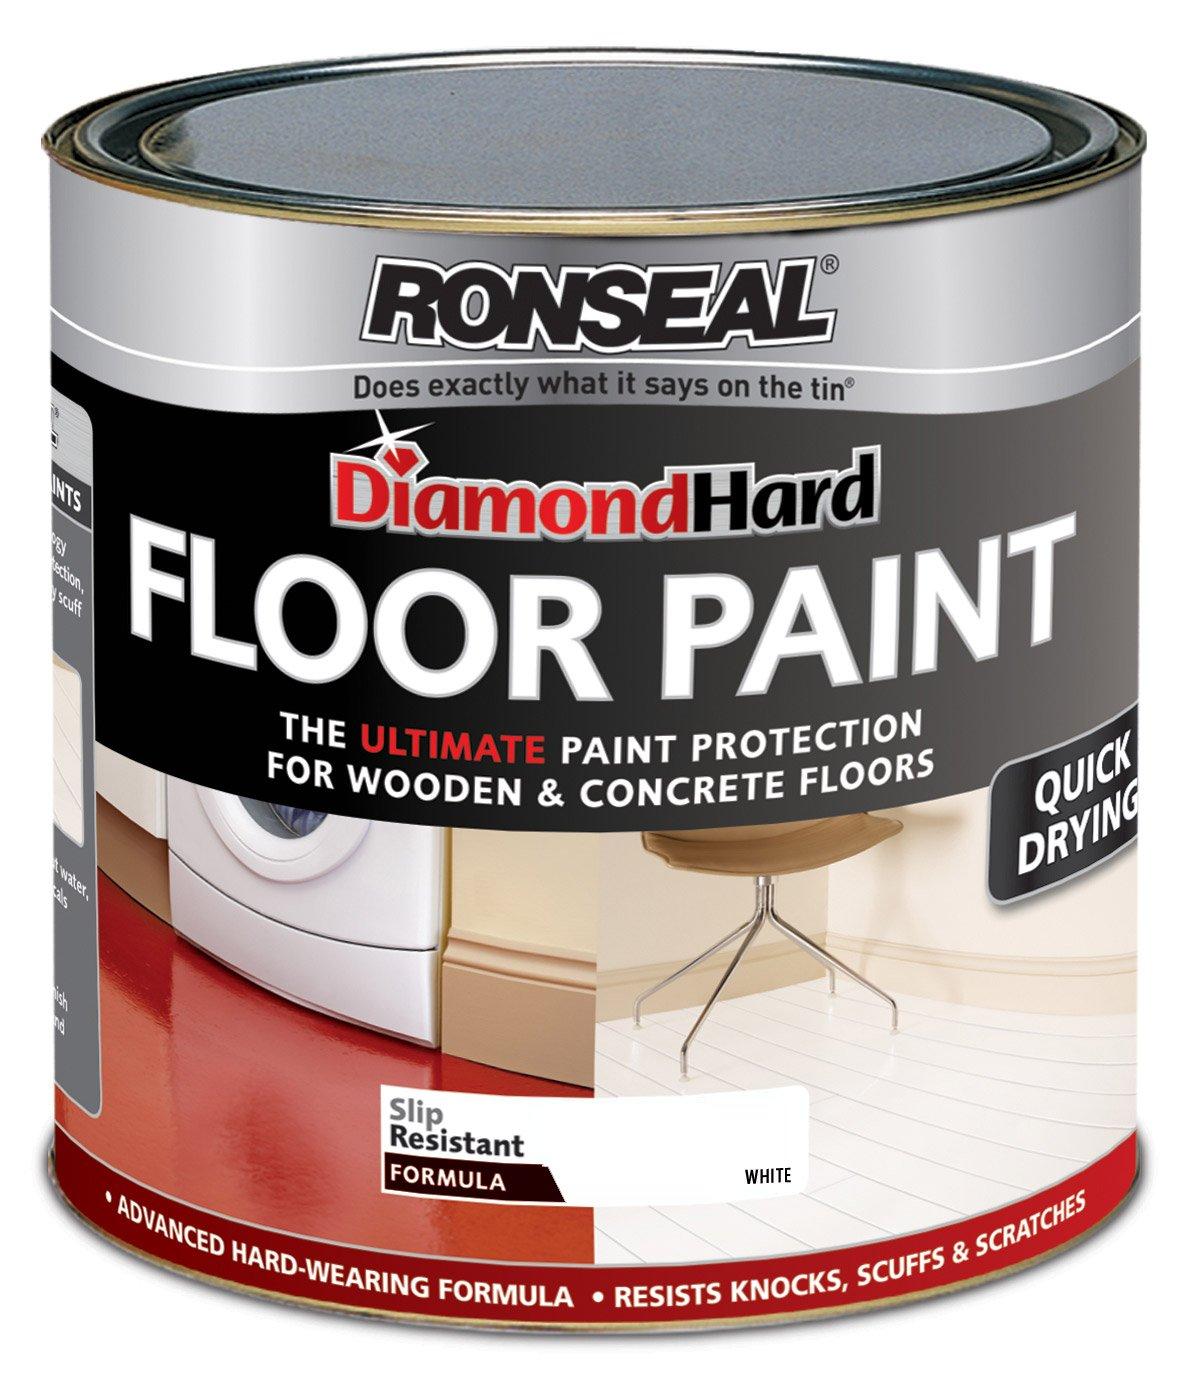 ronseal dhfpwh25l 25l diamond hard floor paint white amazoncouk diy u0026 tools